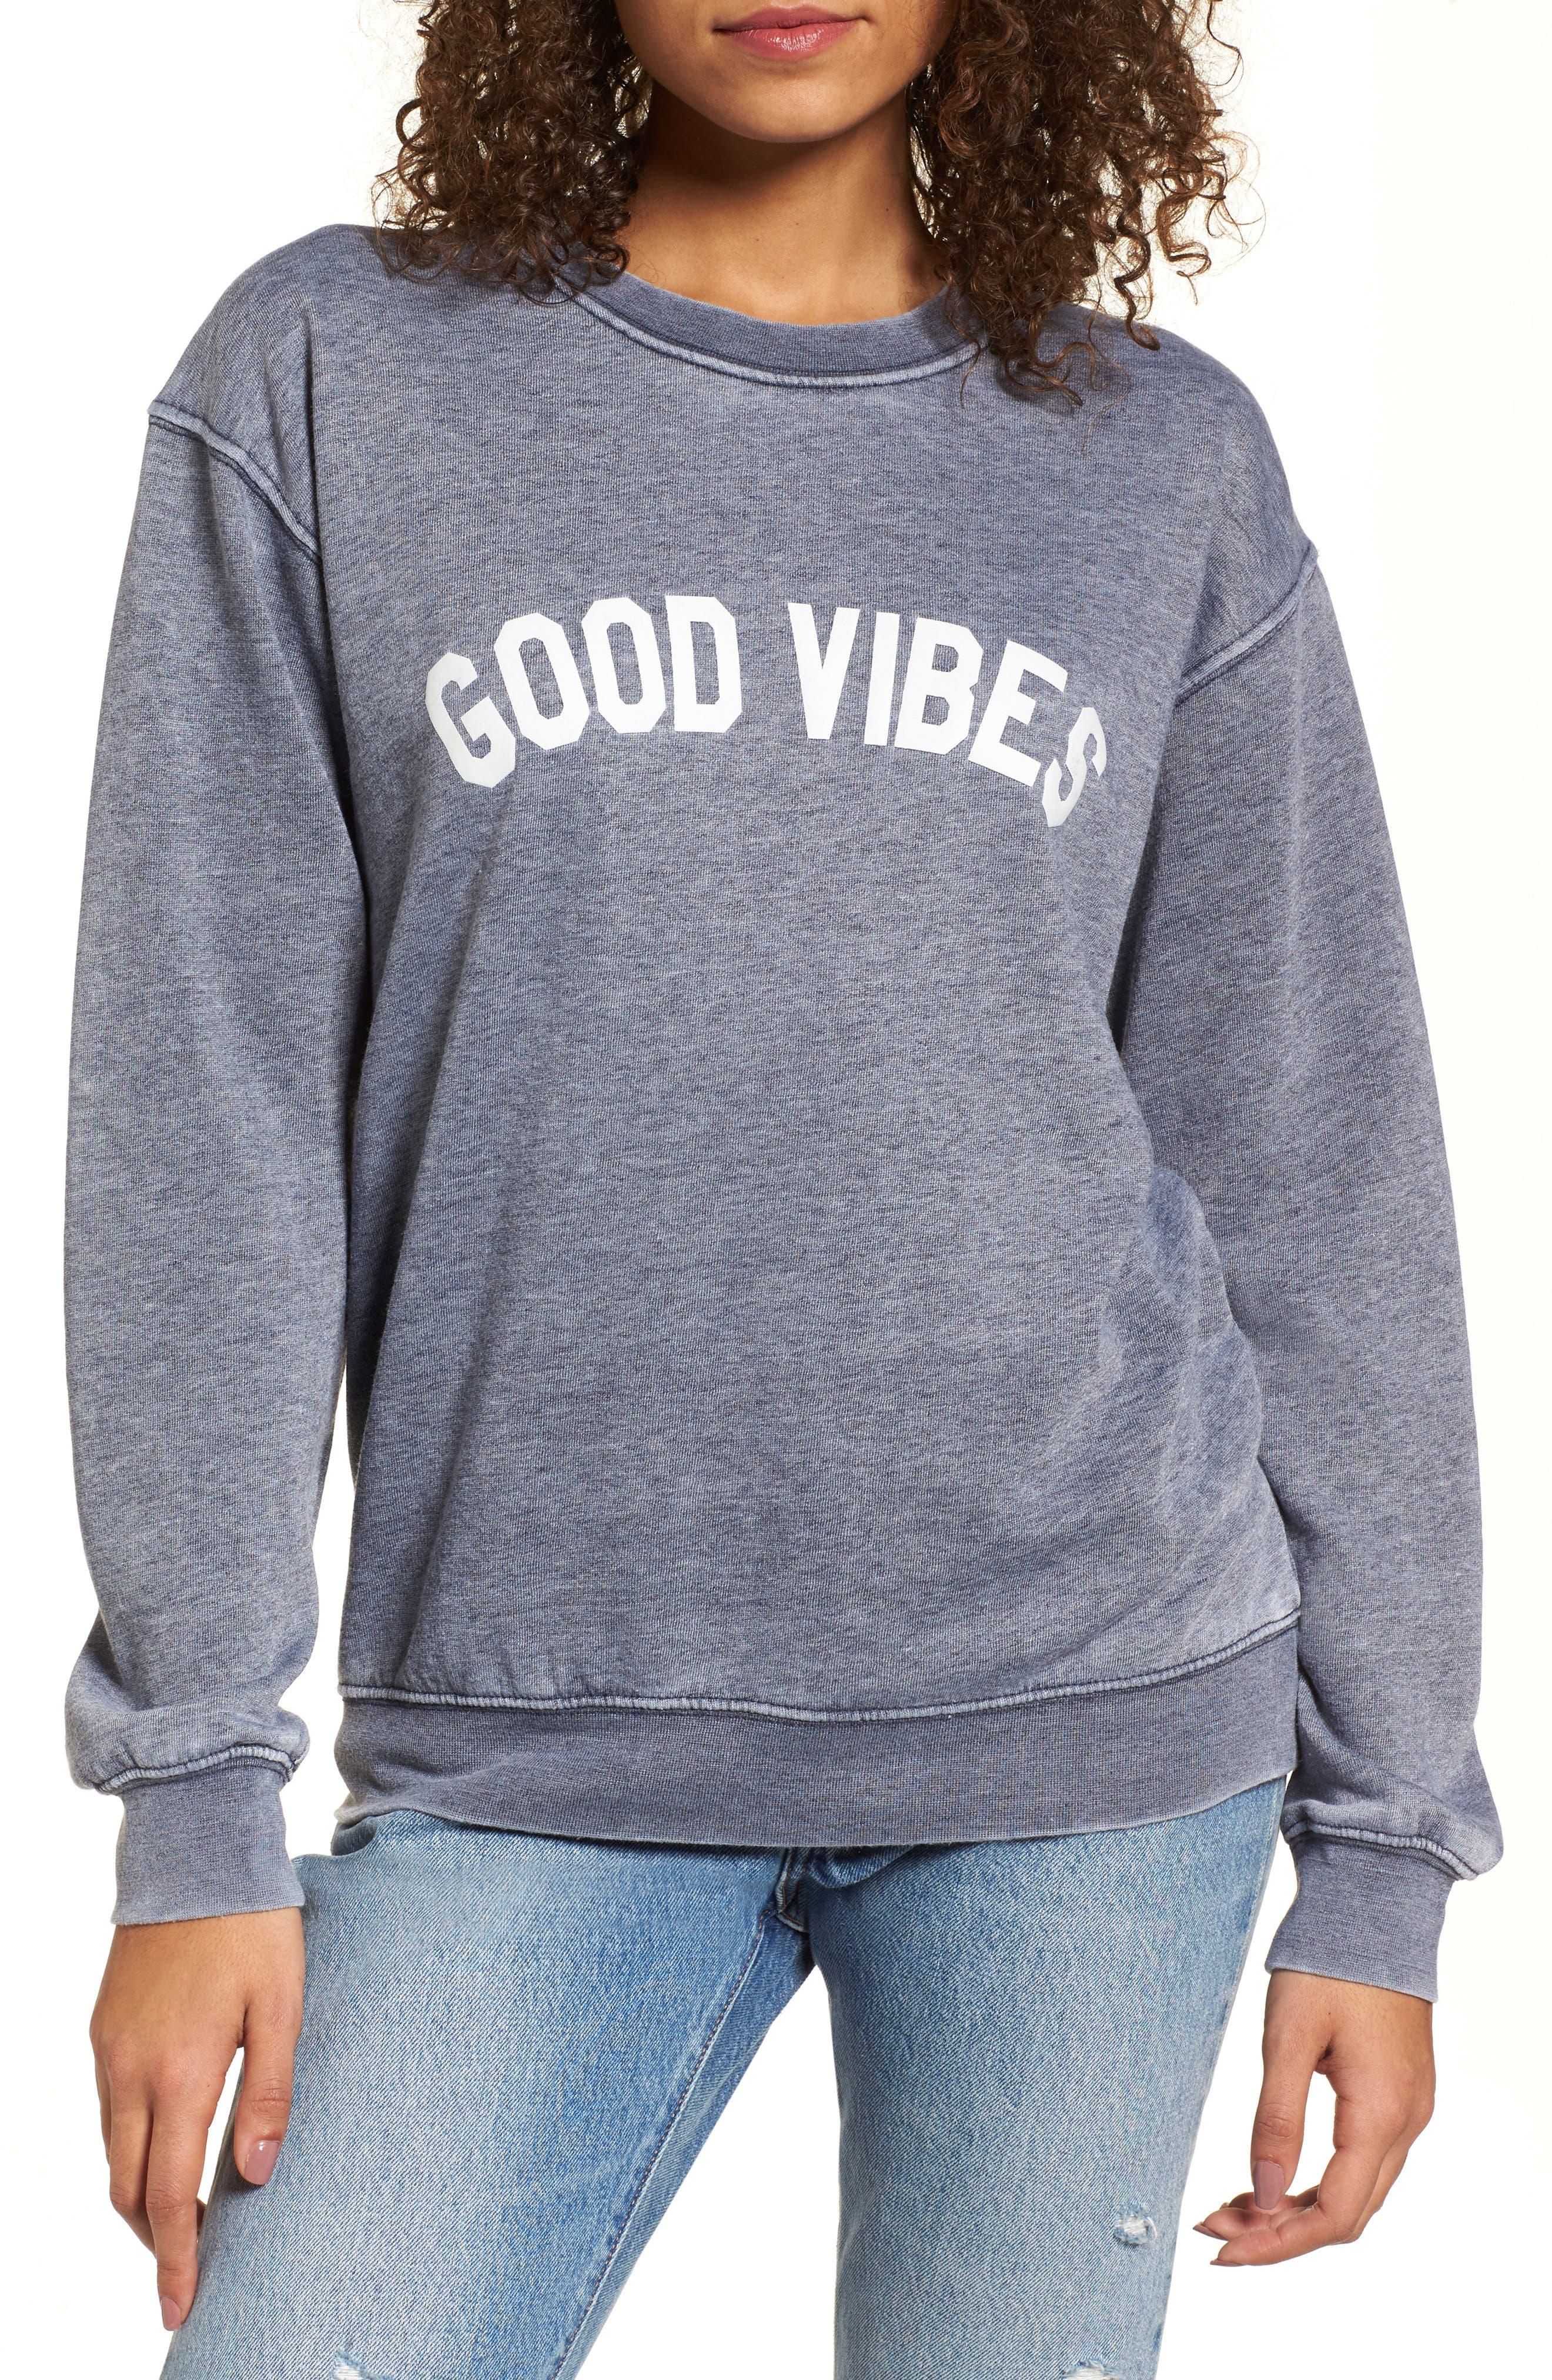 Sub_Urban Riot Good Vibes Burnout Sweatshirt